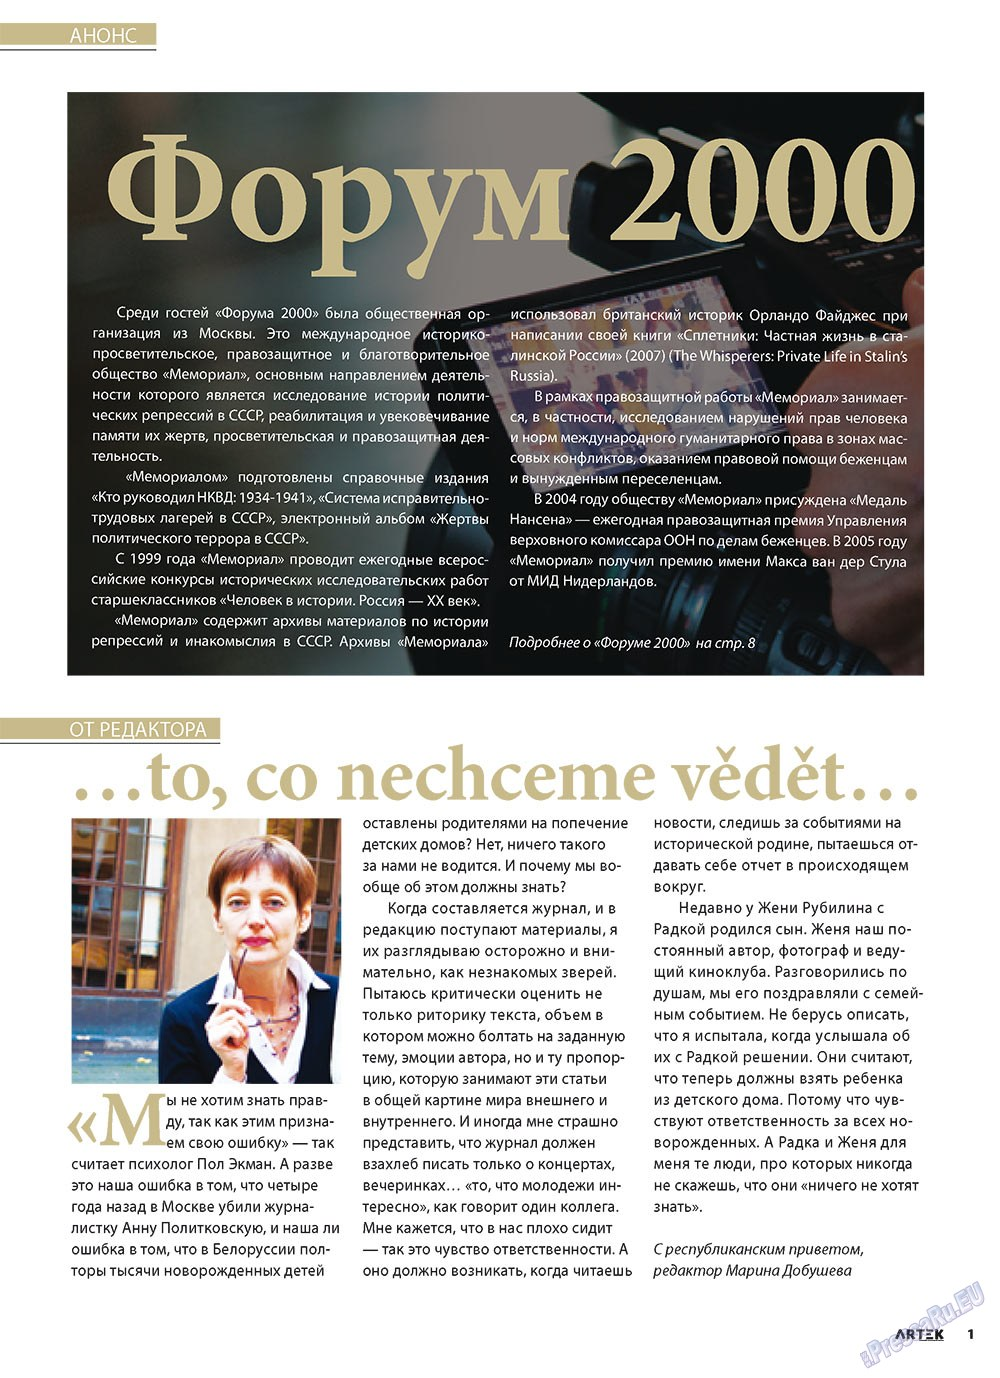 Артек (журнал). 2010 год, номер 5, стр. 3